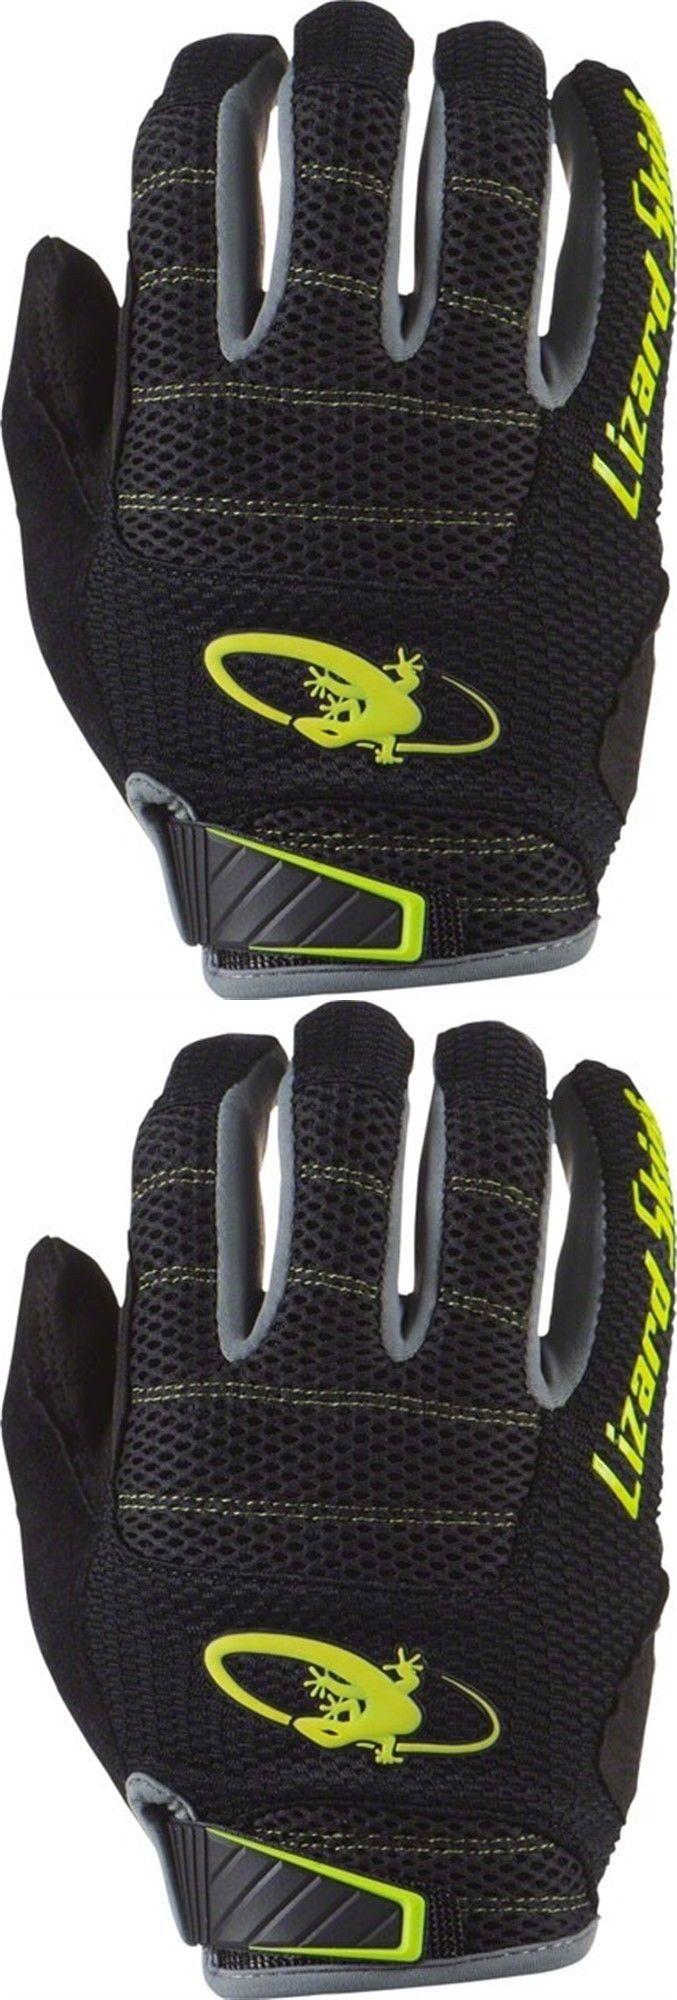 Gloves lizard skins monitor am gloves jet black neon sm